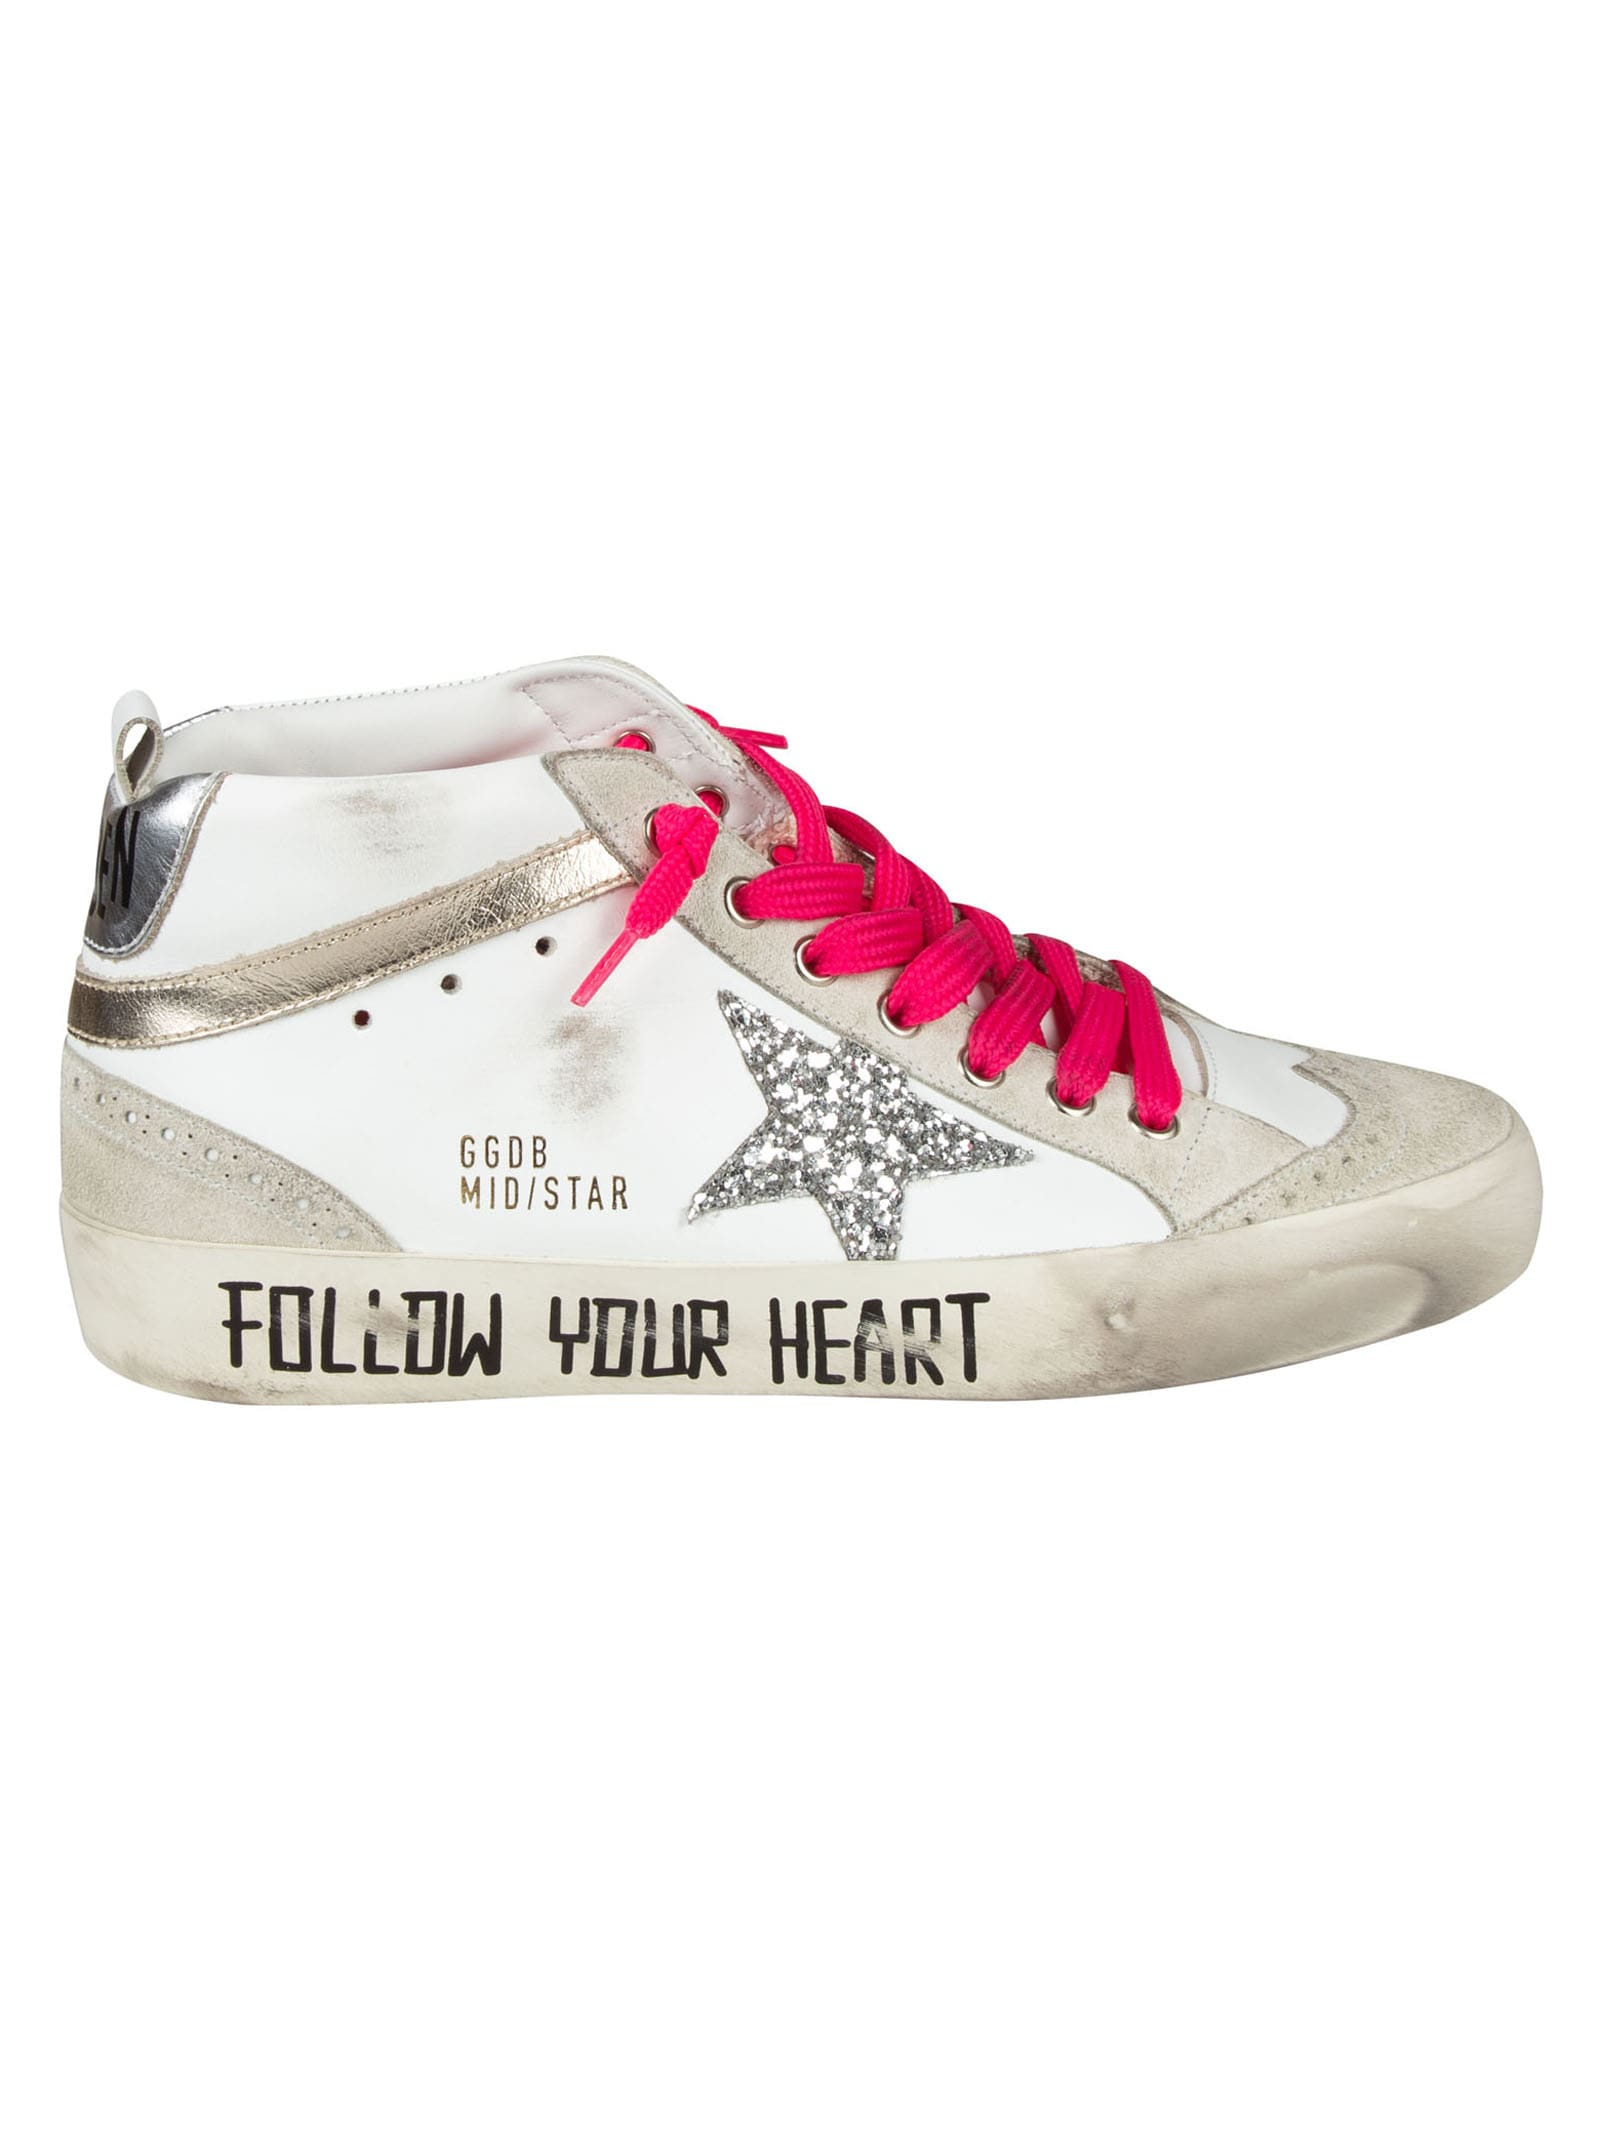 Golden Goose Mid-star Classic Sneakers